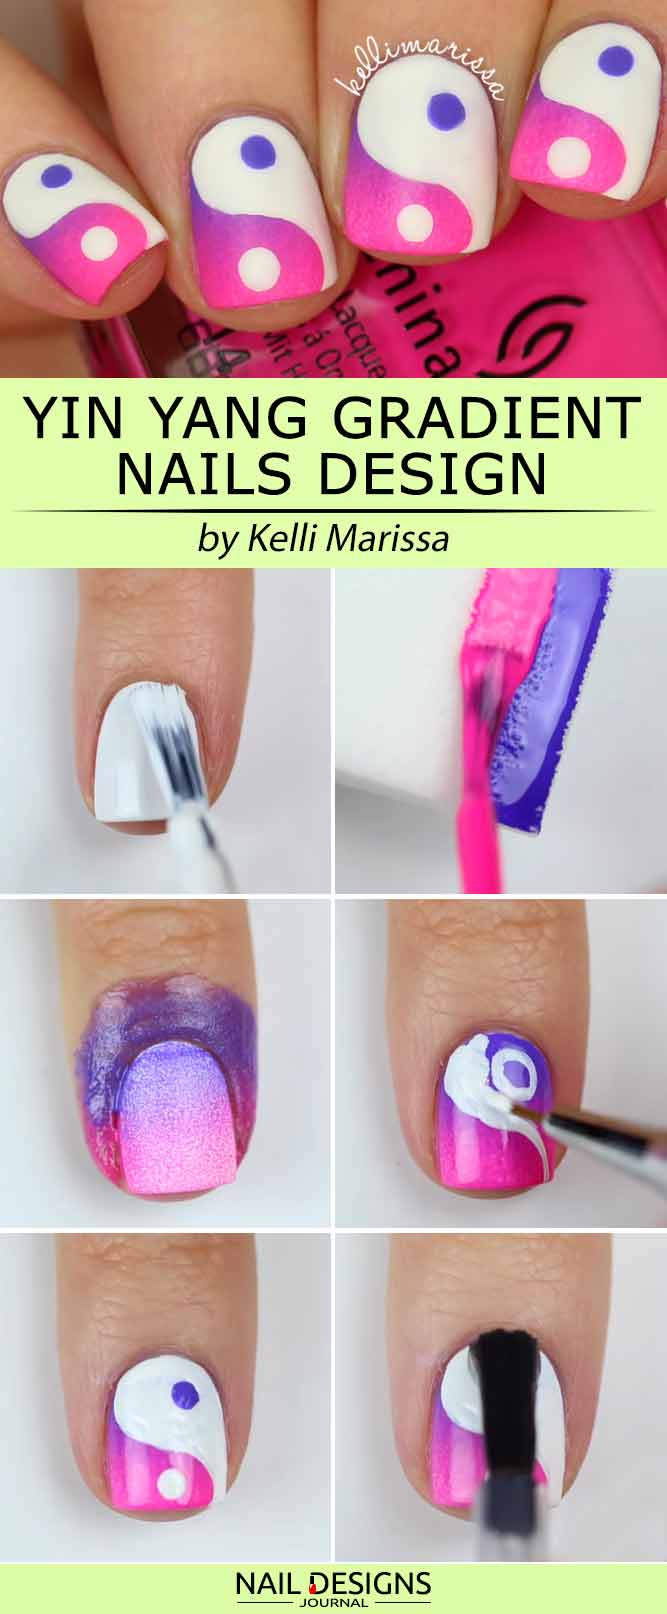 Yin Yang Gradient Nail Art